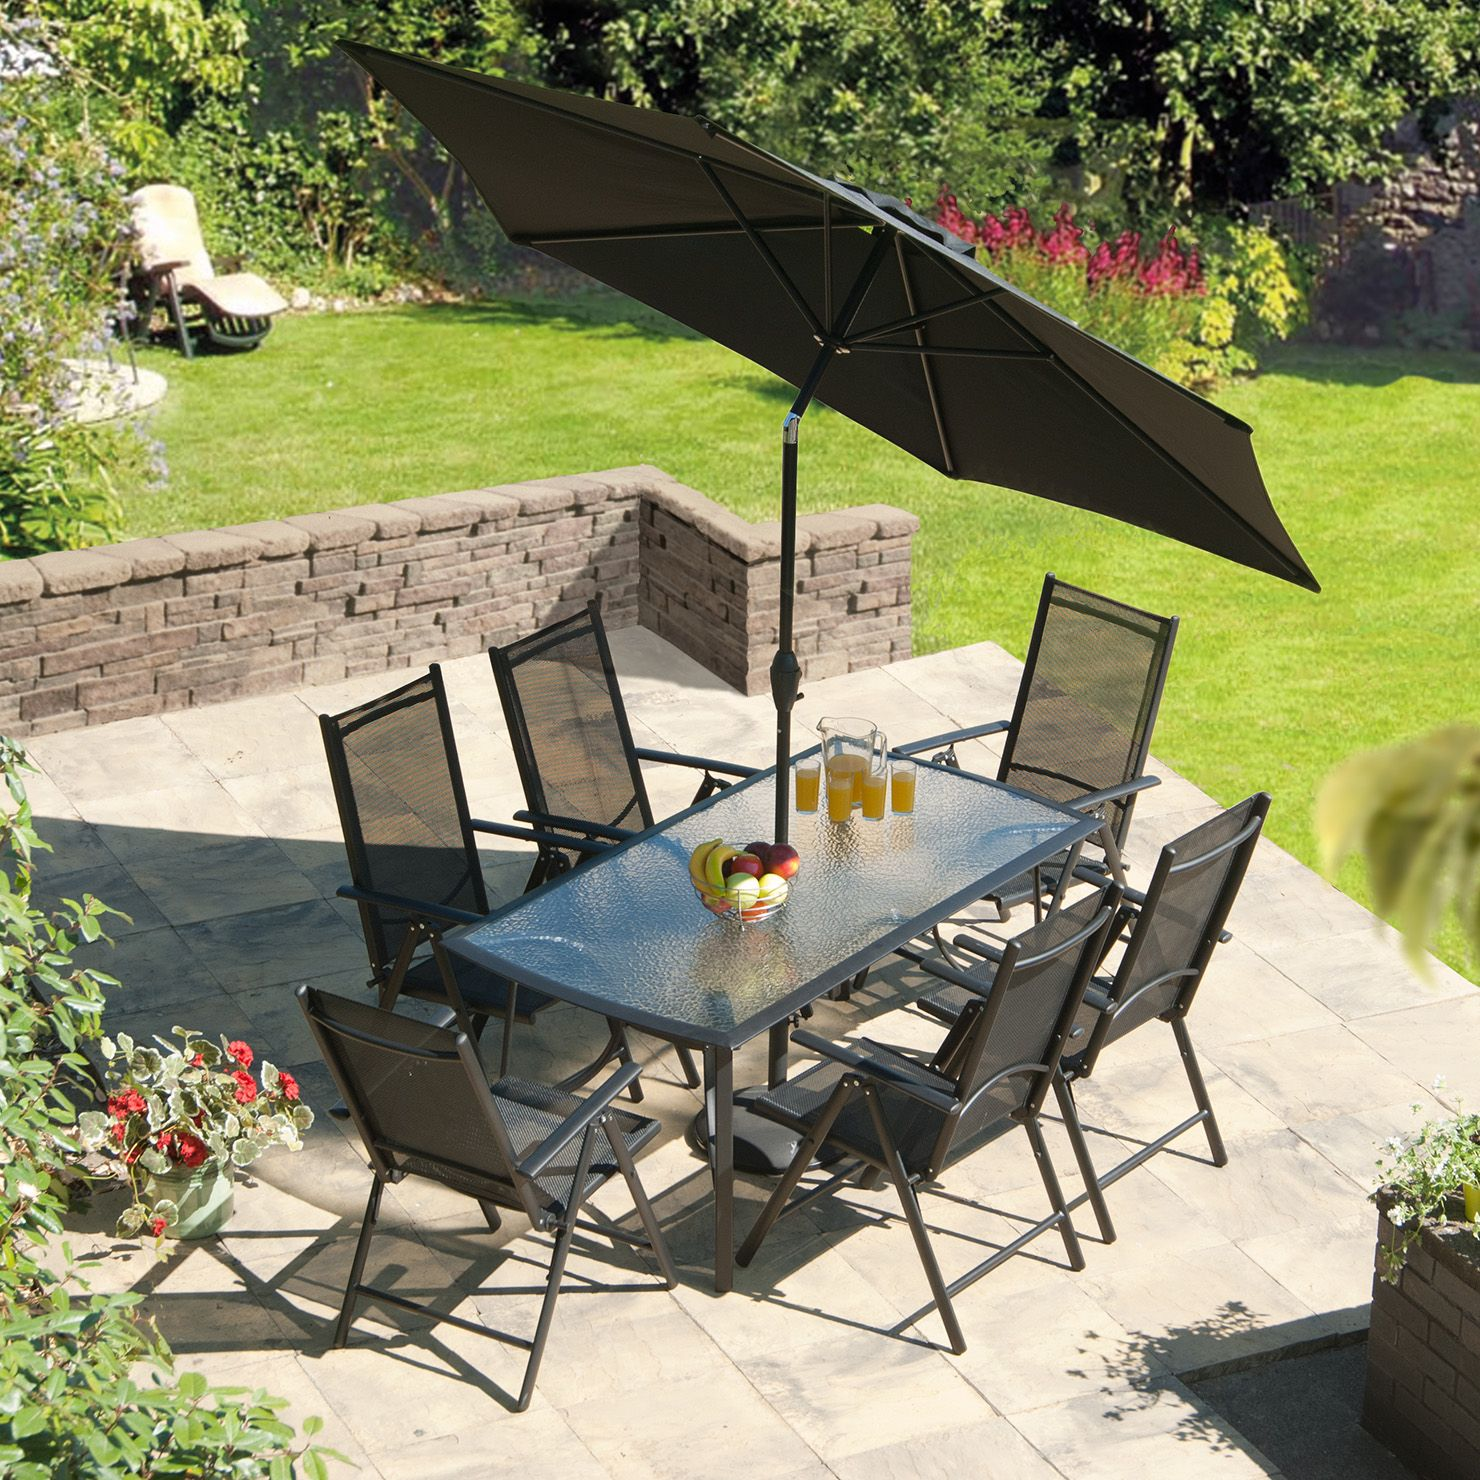 SunTime Capri 6 Seater Aluminium Rectangular Dining Set  Black  Garden  FurnitureOutdoor. SunTime Capri 6 Seater Aluminium Rectangular Dining Set  Black